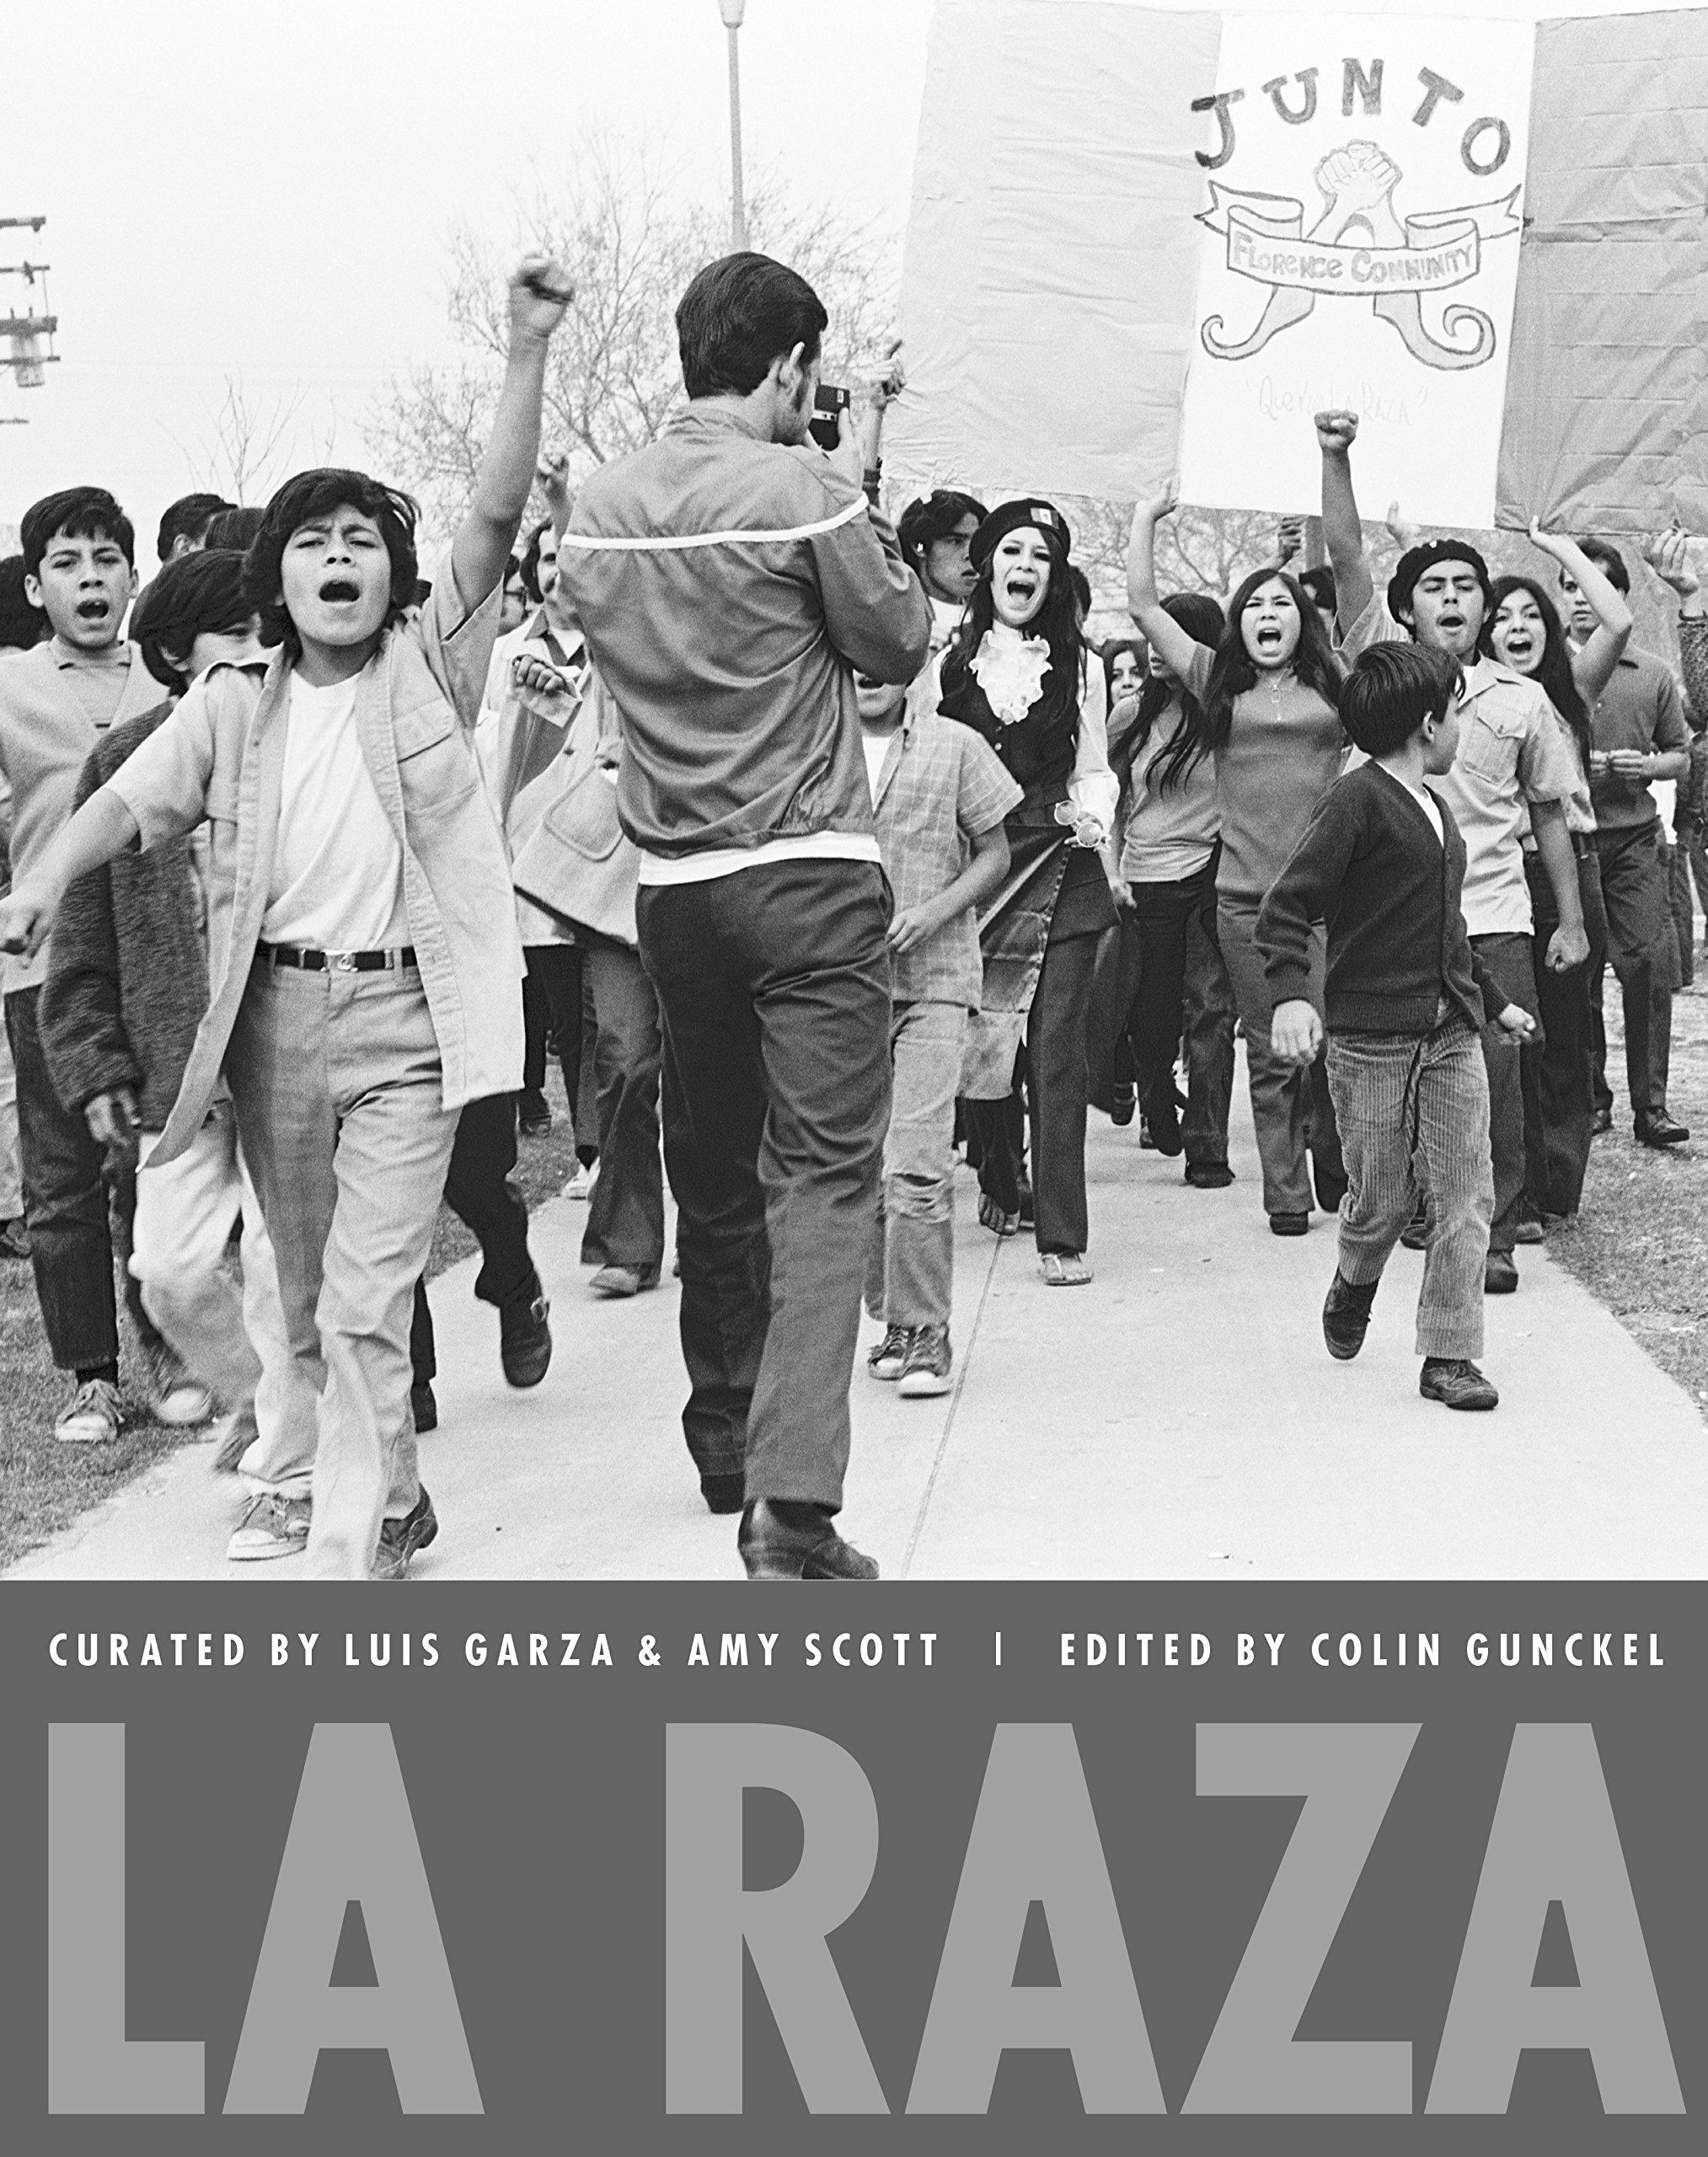 La Raza: Garza, Luis, Garza, Luis C., Scott, Amy, Gunckel, Colin: 9780895511652: Amazon.com: Books